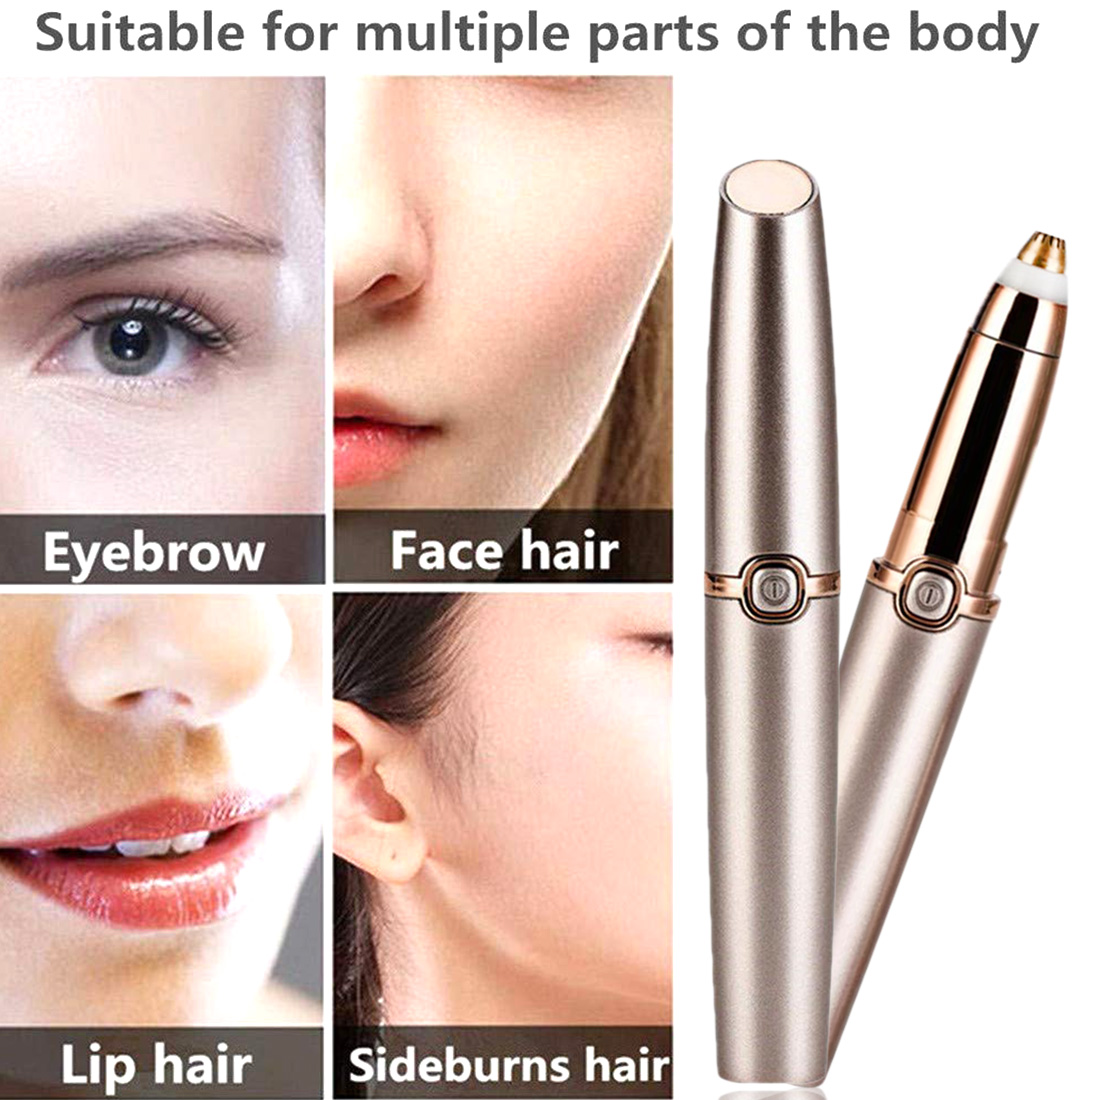 Rechargeable Electric Eyebrow Trimmer Makeup Painless Eye Brow Mini Shaver Razors Portable Facial Hair Remover Women depilator